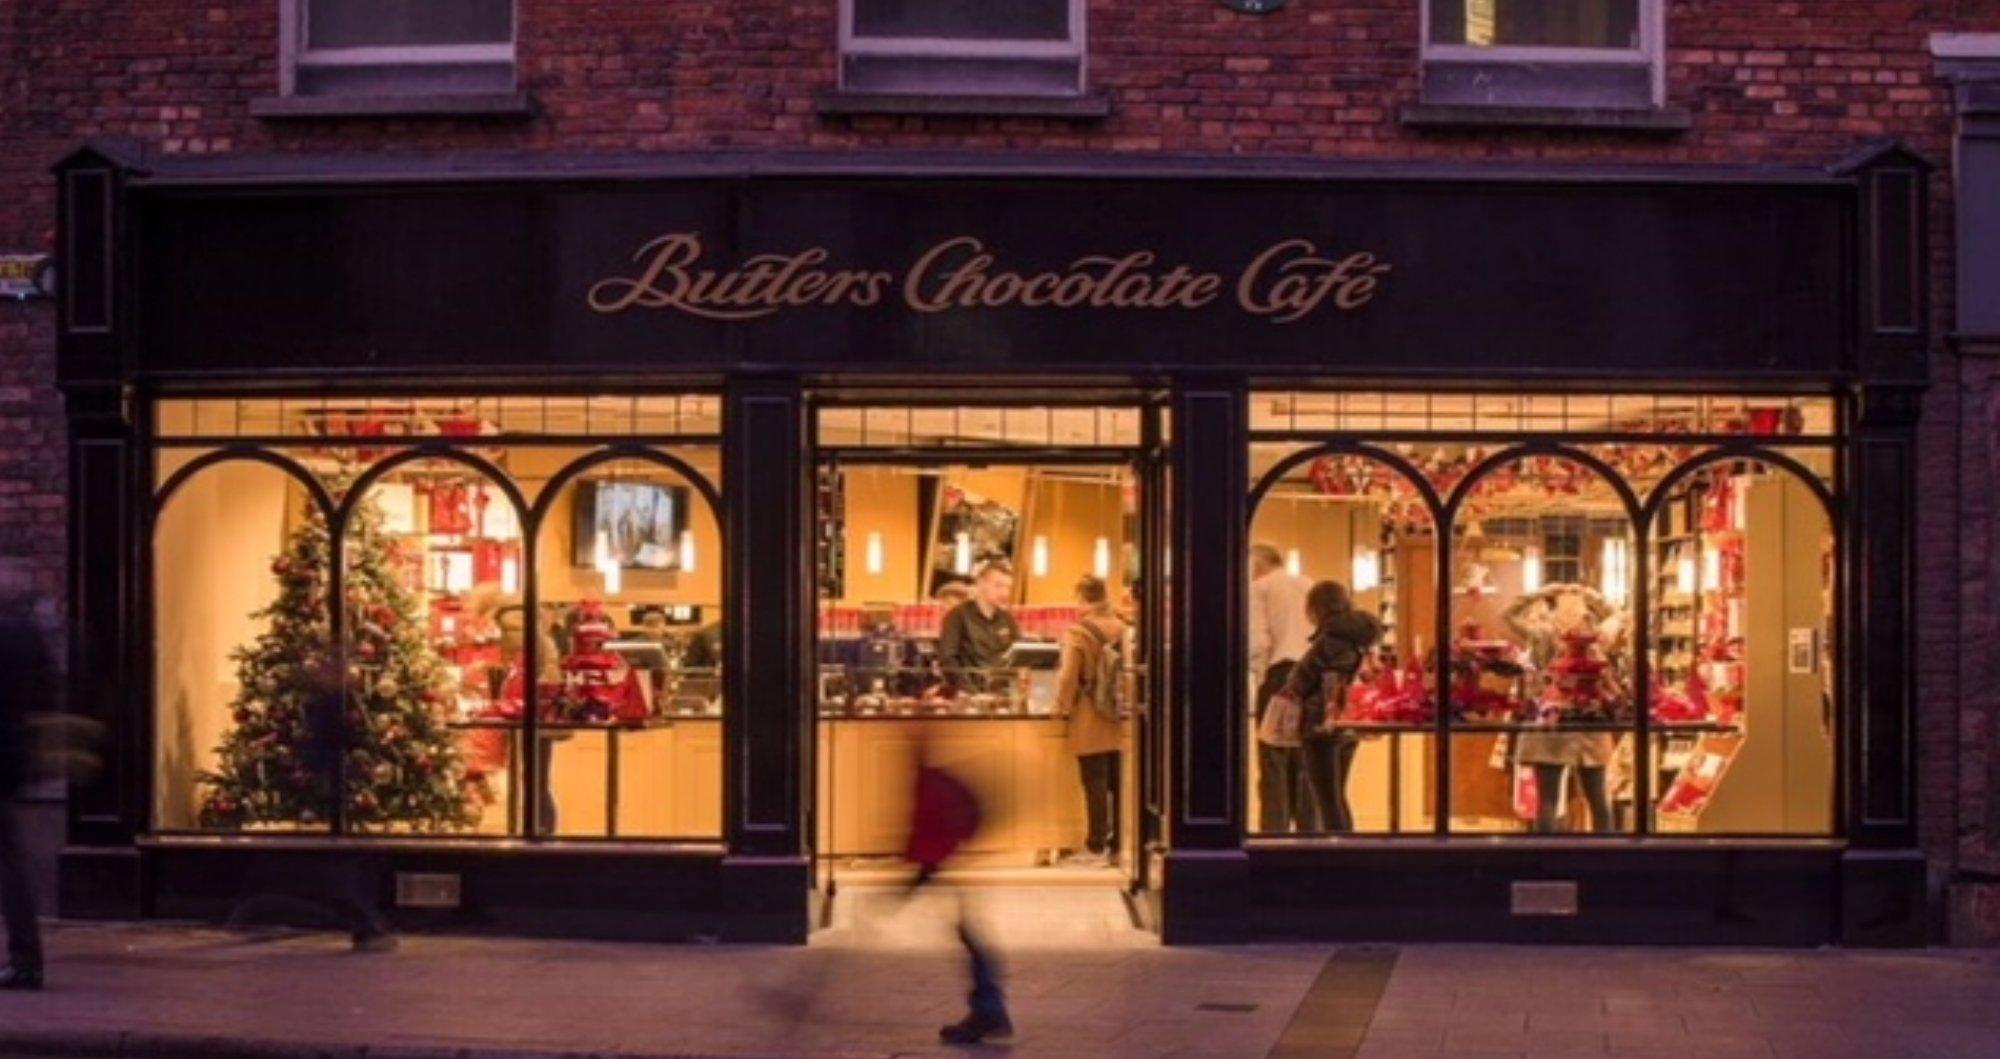 Butlers Chocolate Café, 117 Grafton Street